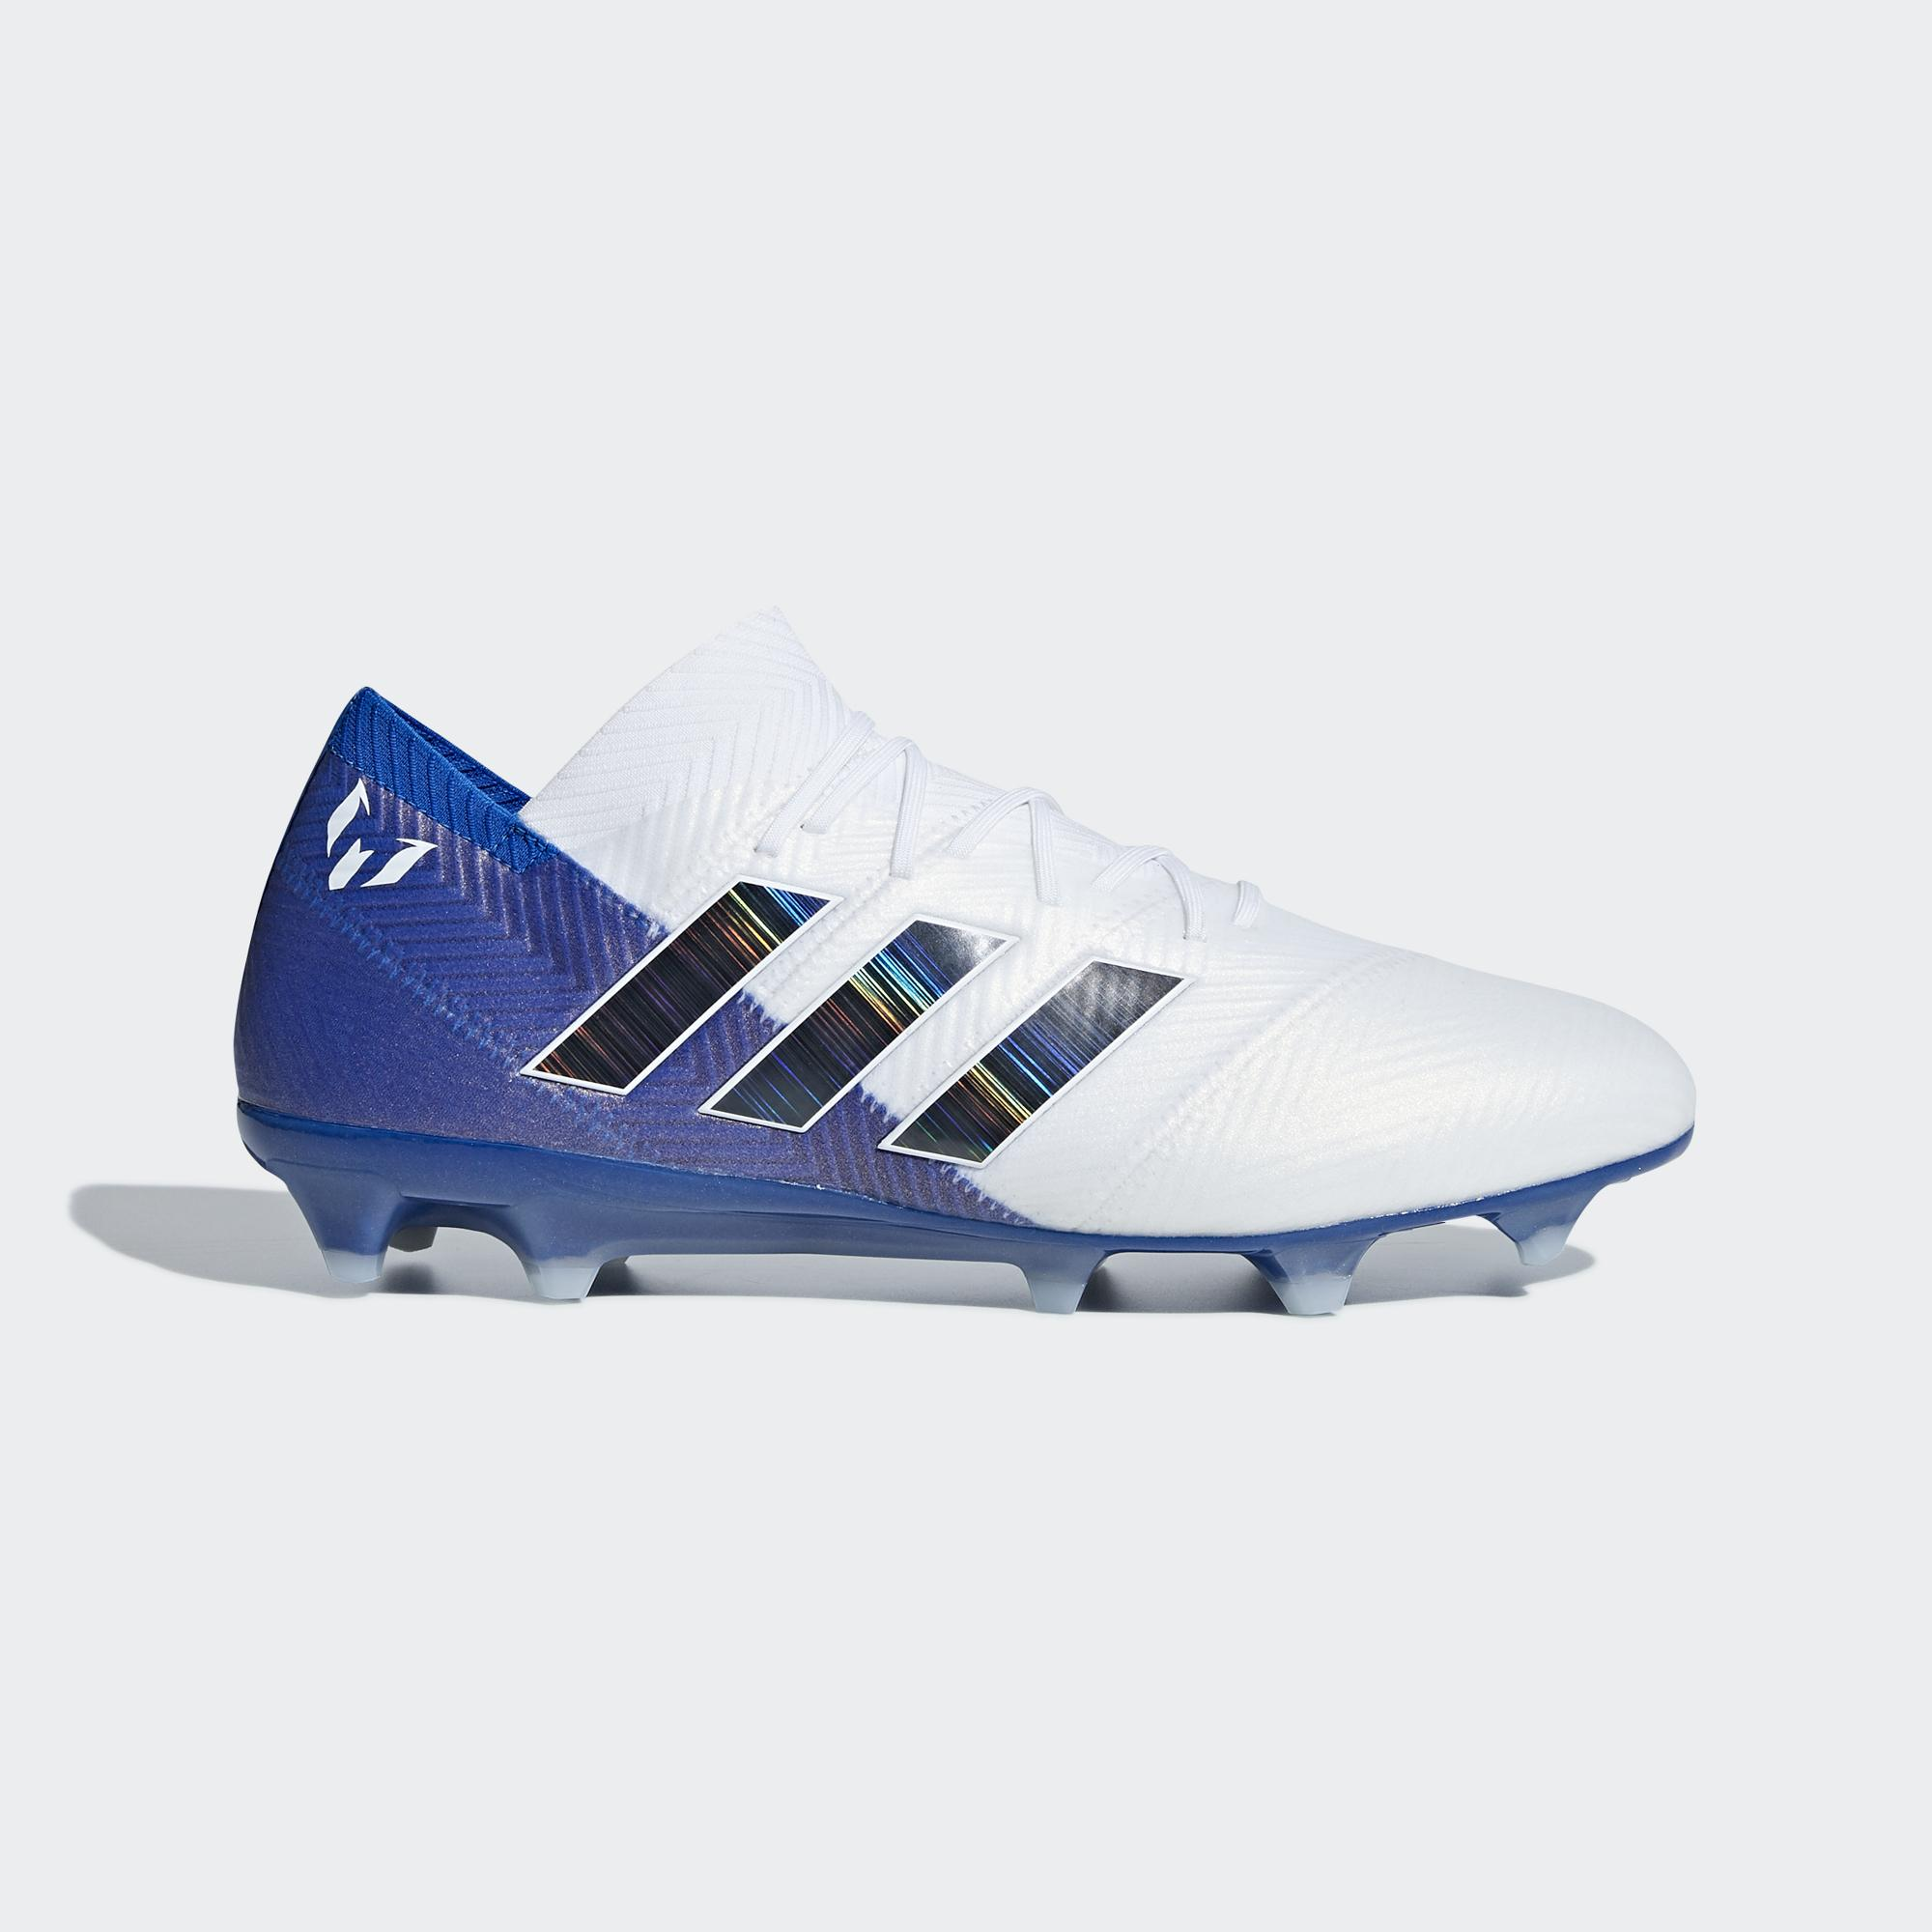 Adidas Scarpe Calcio Nemeziz Messi 18.1 Fg